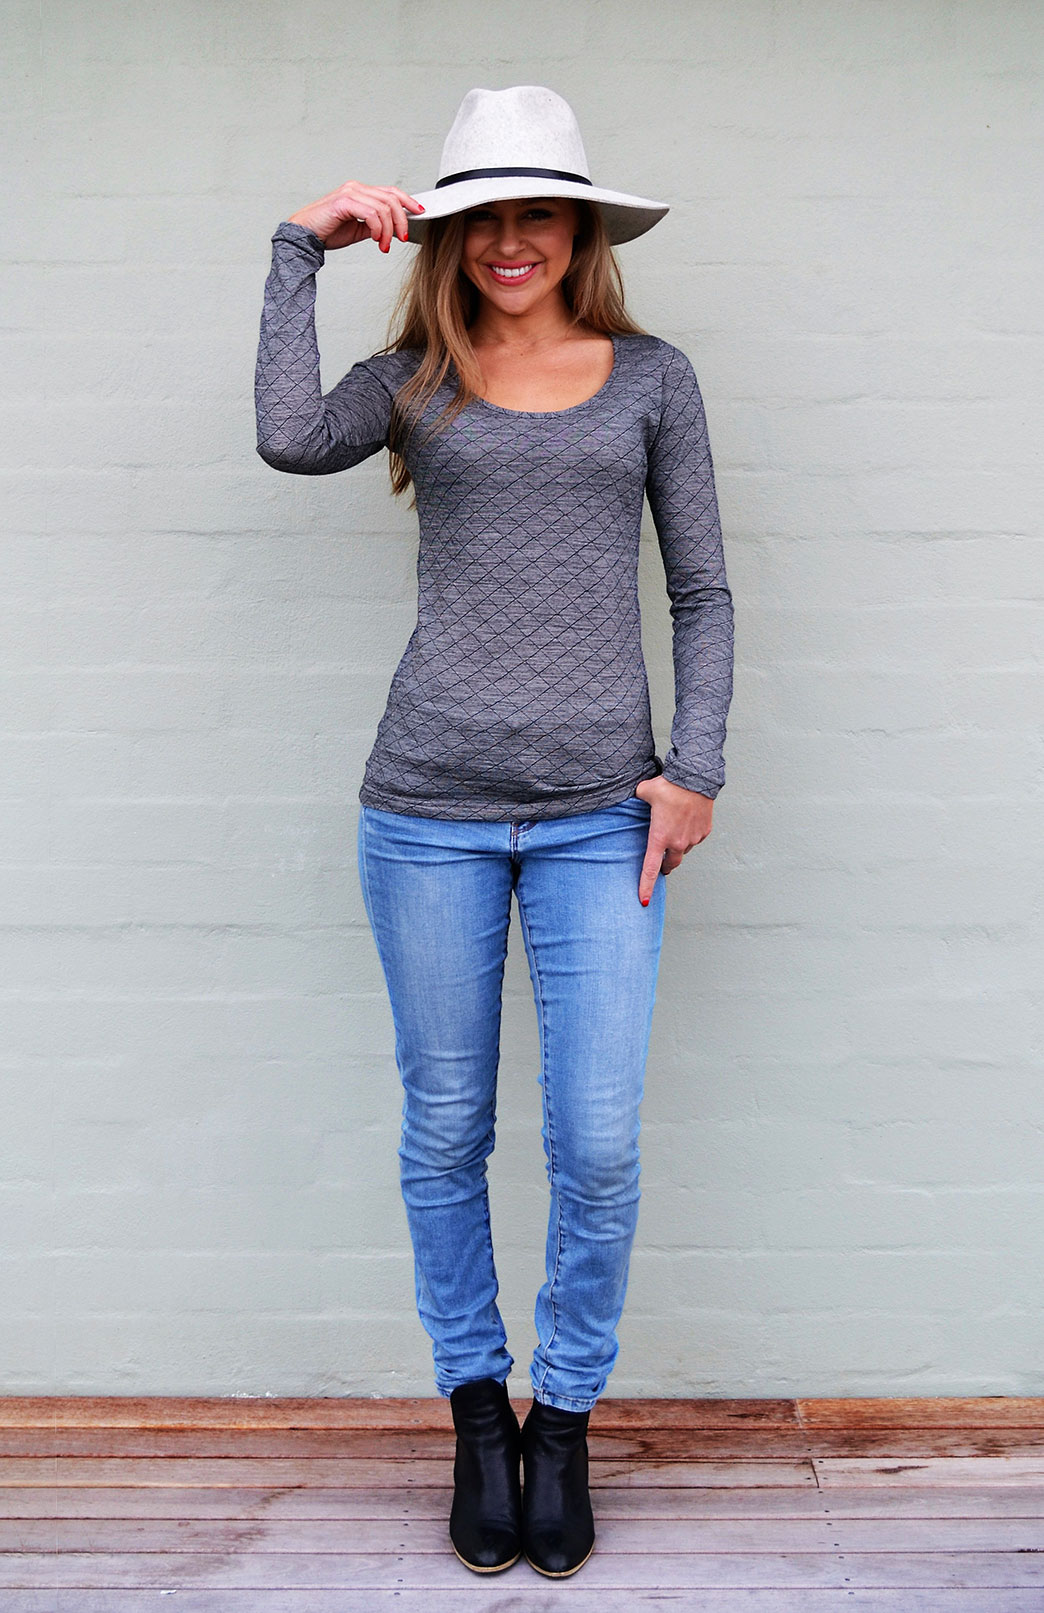 Scoop Neck Top - Patterned - Women's Black Grey Patterned Merino Wool Long Sleeved Thermal Top with Scoop Neckline - Smitten Merino Tasmania Australia